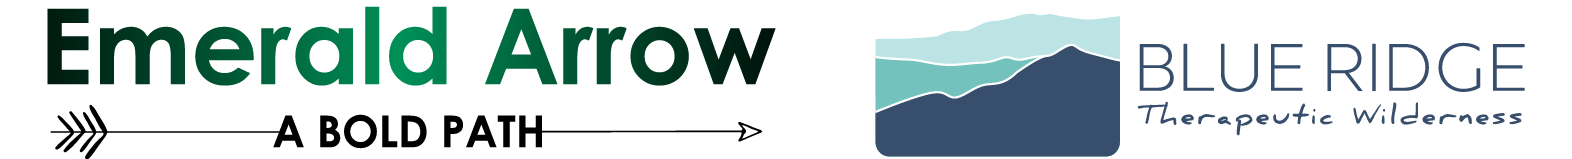 Emerald Arrow logo and Blue Ridge therapeutic Wilderness logo